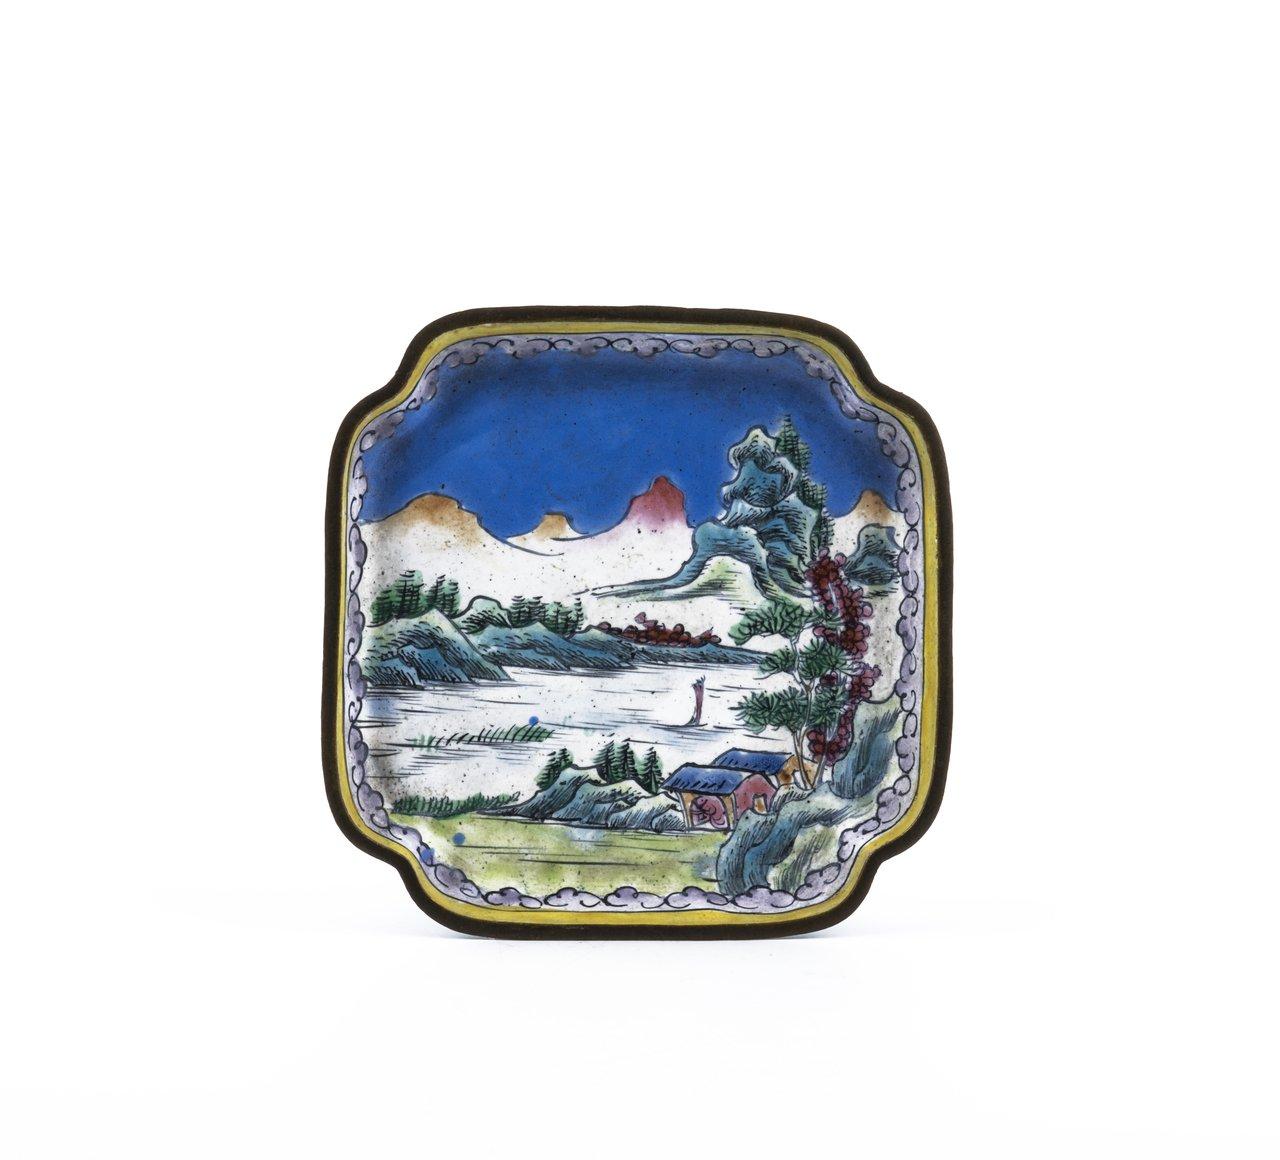 An Antique Chinese Canton Enamel Square Landscape Dish